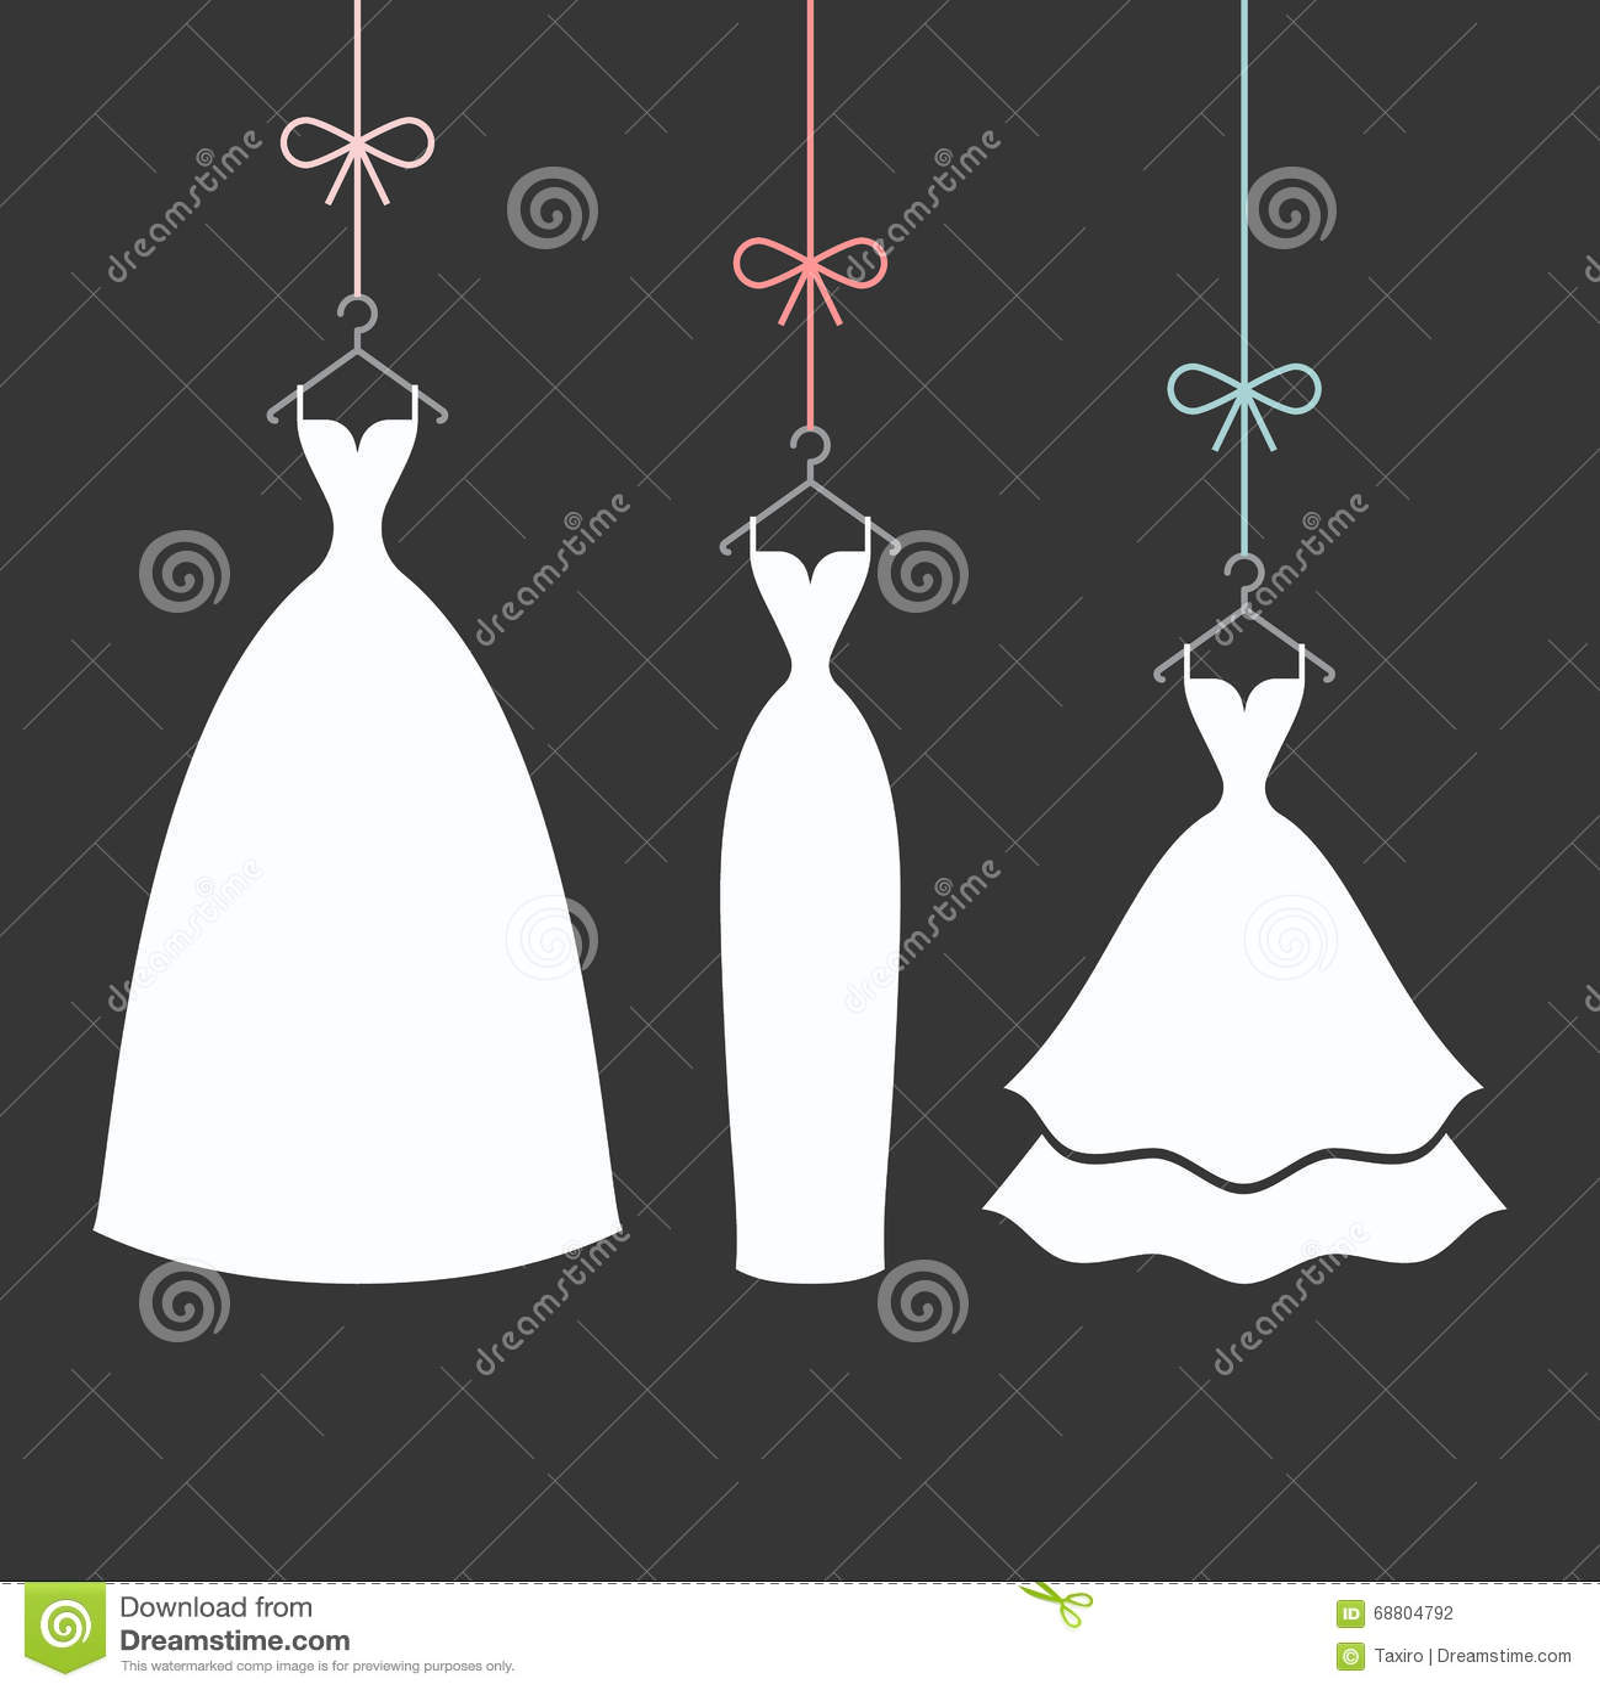 Bridal dress on a hanger stock vector. Illustration of dance - 68804792